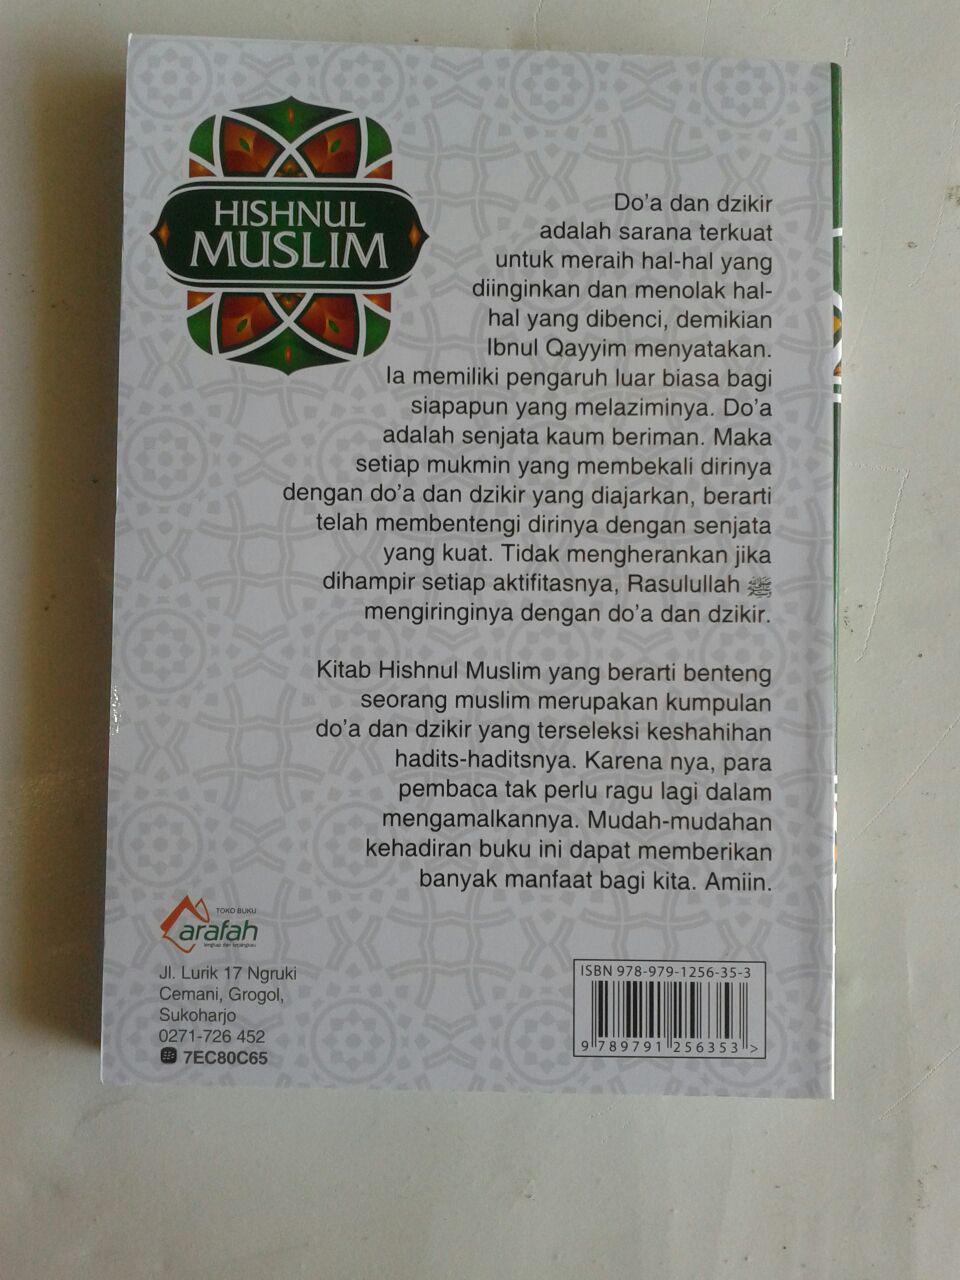 Buku Saku Hishnul Muslim Panduan Doa Dan Dzikir Sehari Hari cover